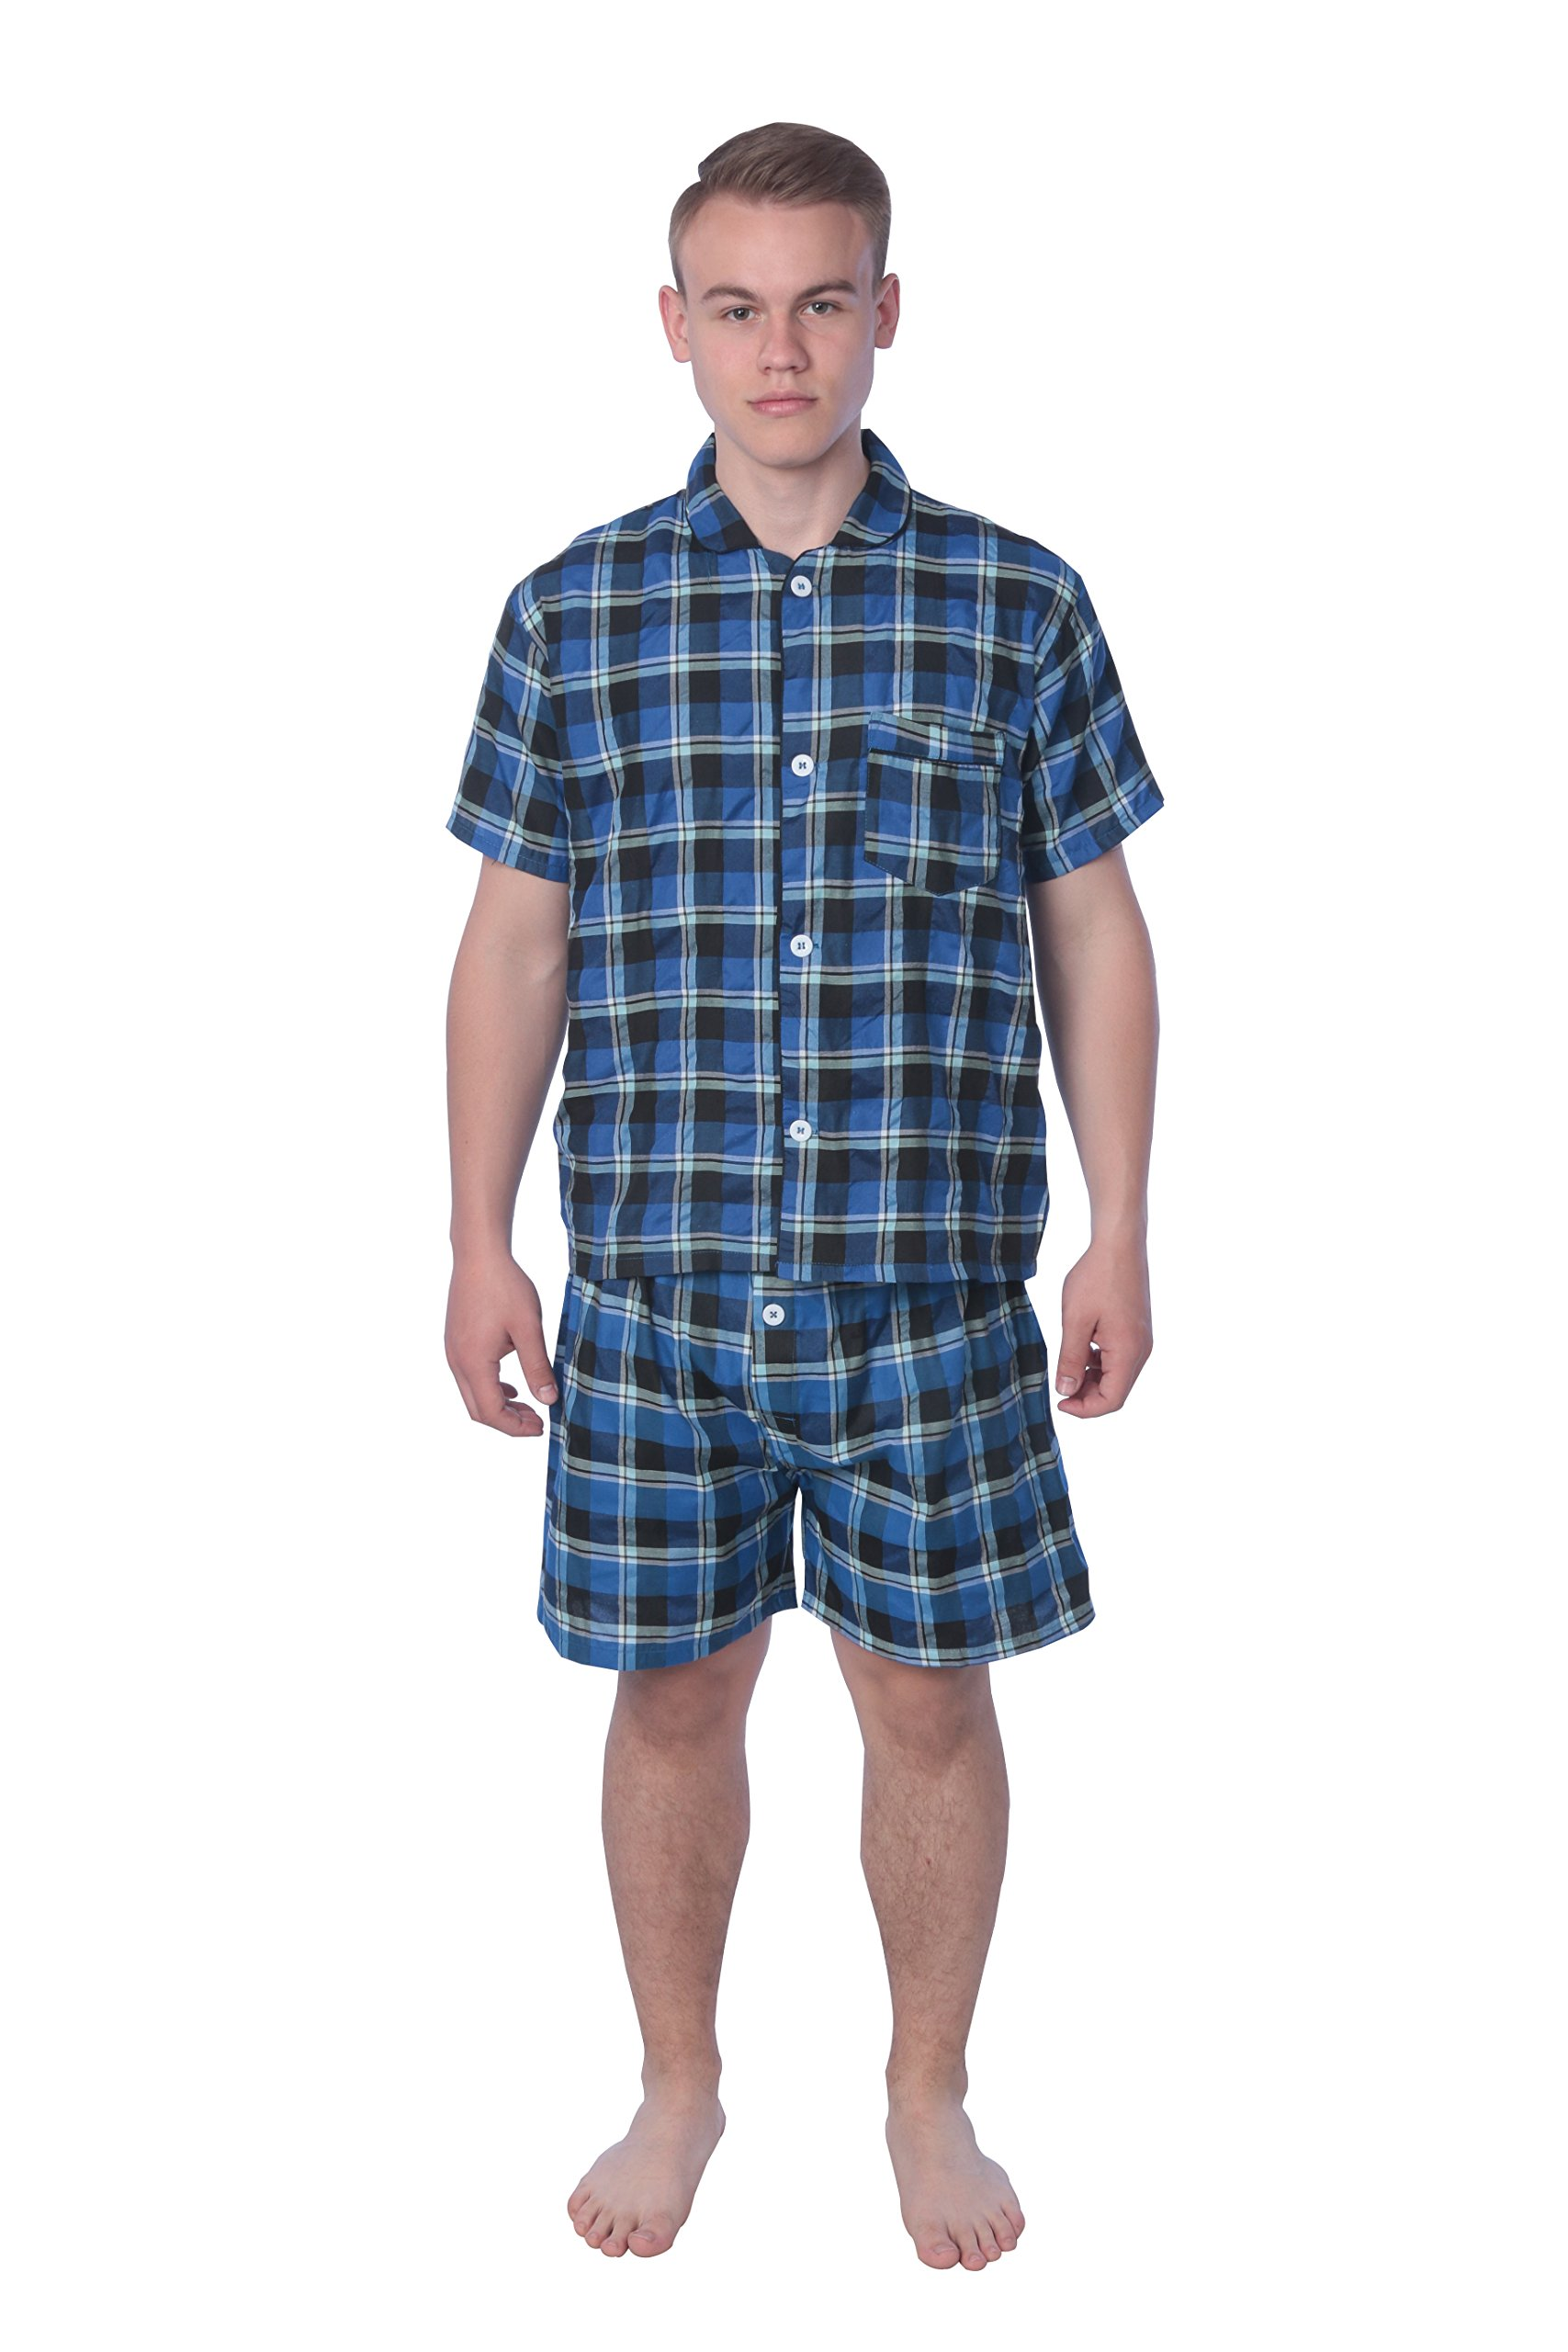 James Fiallo Mens Pajamas Set, 100% Cotton, Comfortable, Non Sweating, All Seasons, Winter, Spring, Fall, Summer. (MPJ06-BLU-CHECK.L)